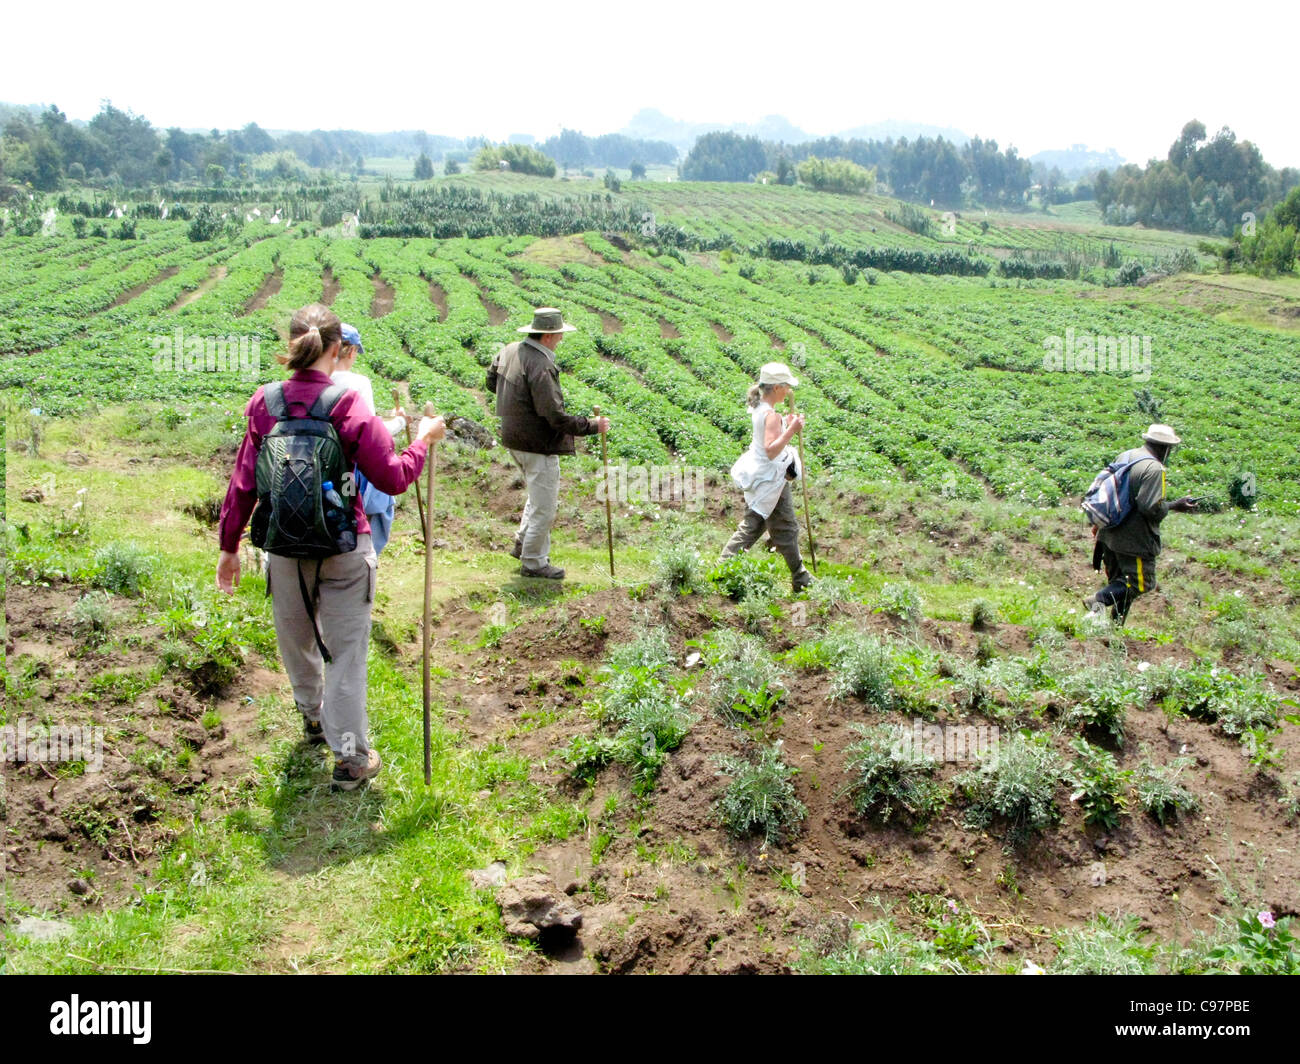 Virunga Mountains, Rwnada, Africa.  Tourists tekking to view the mountain gorillas in Volcanoes National Park. - Stock Image